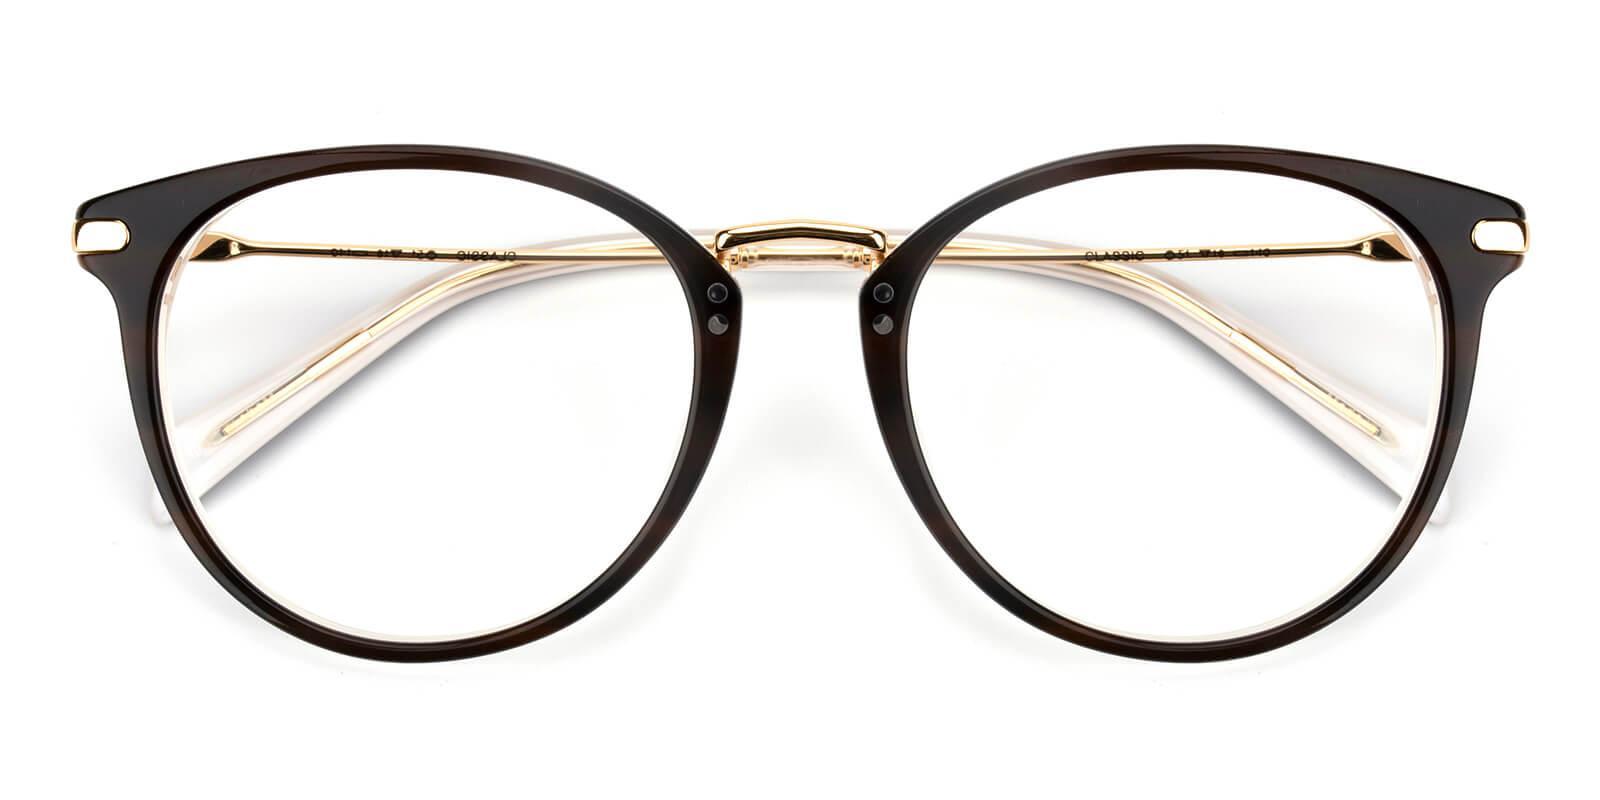 Valkder-Brown-Round-Metal-Eyeglasses-detail